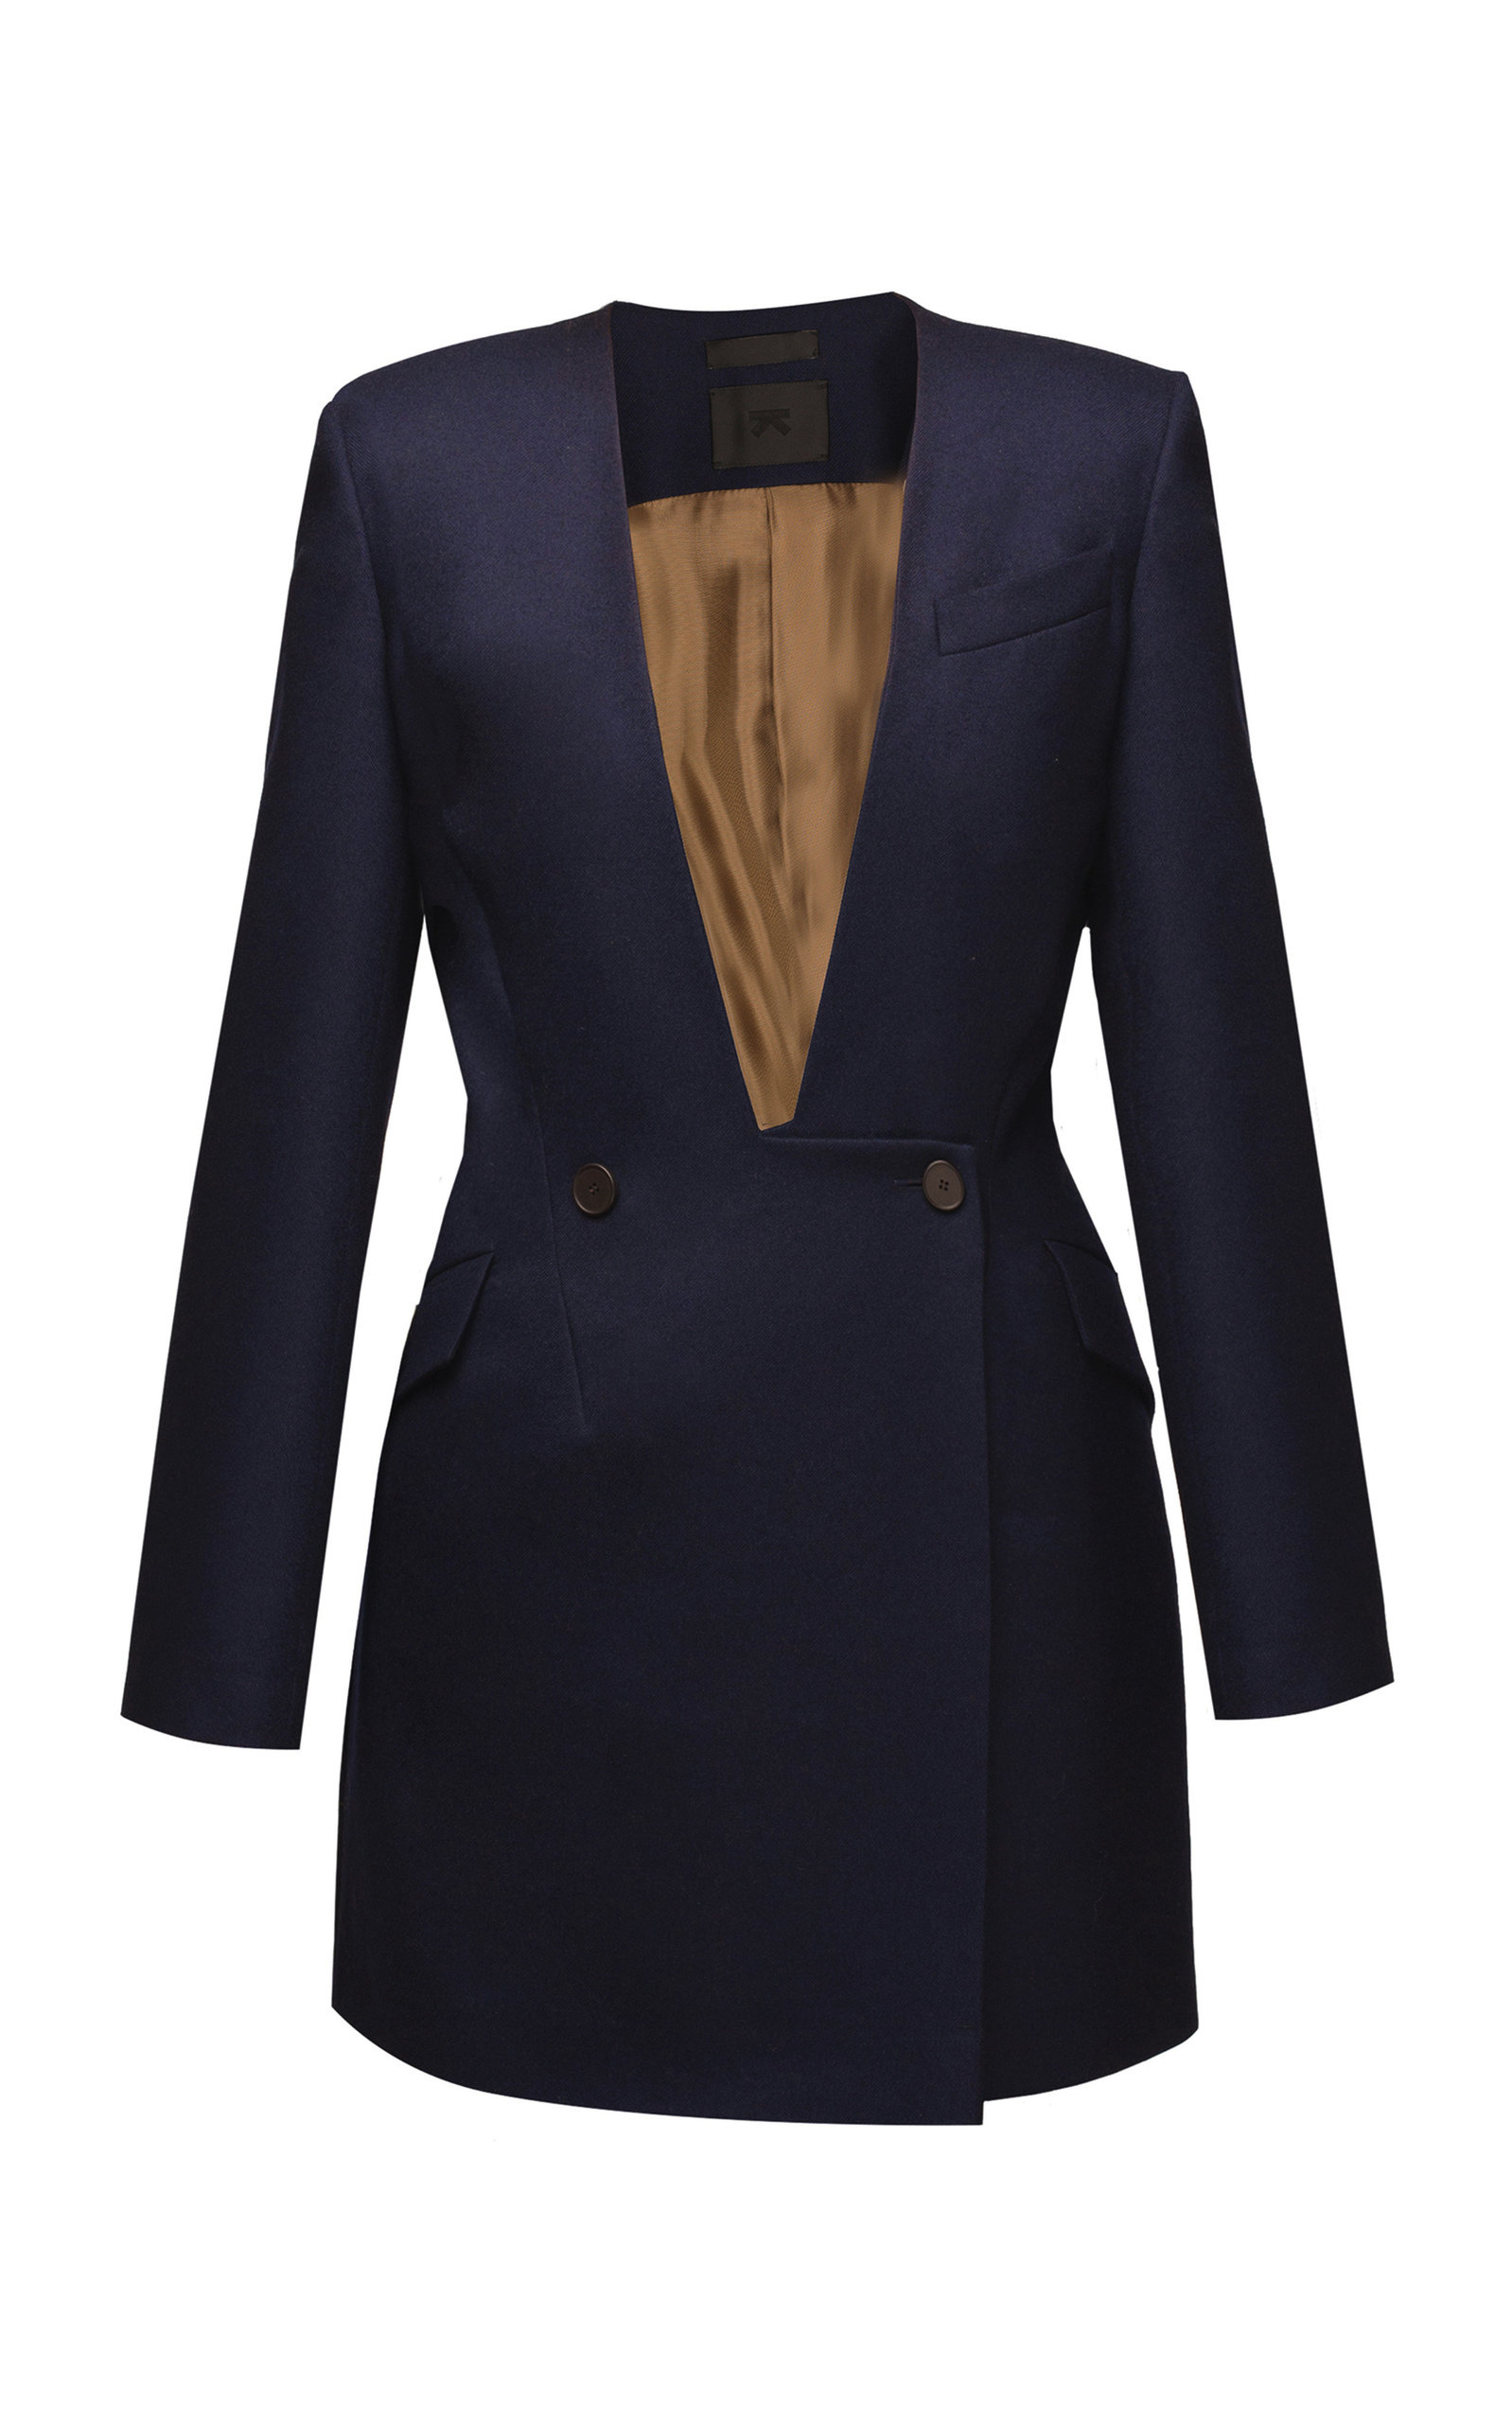 LAKE STUDIO NAVY COAT DRESS